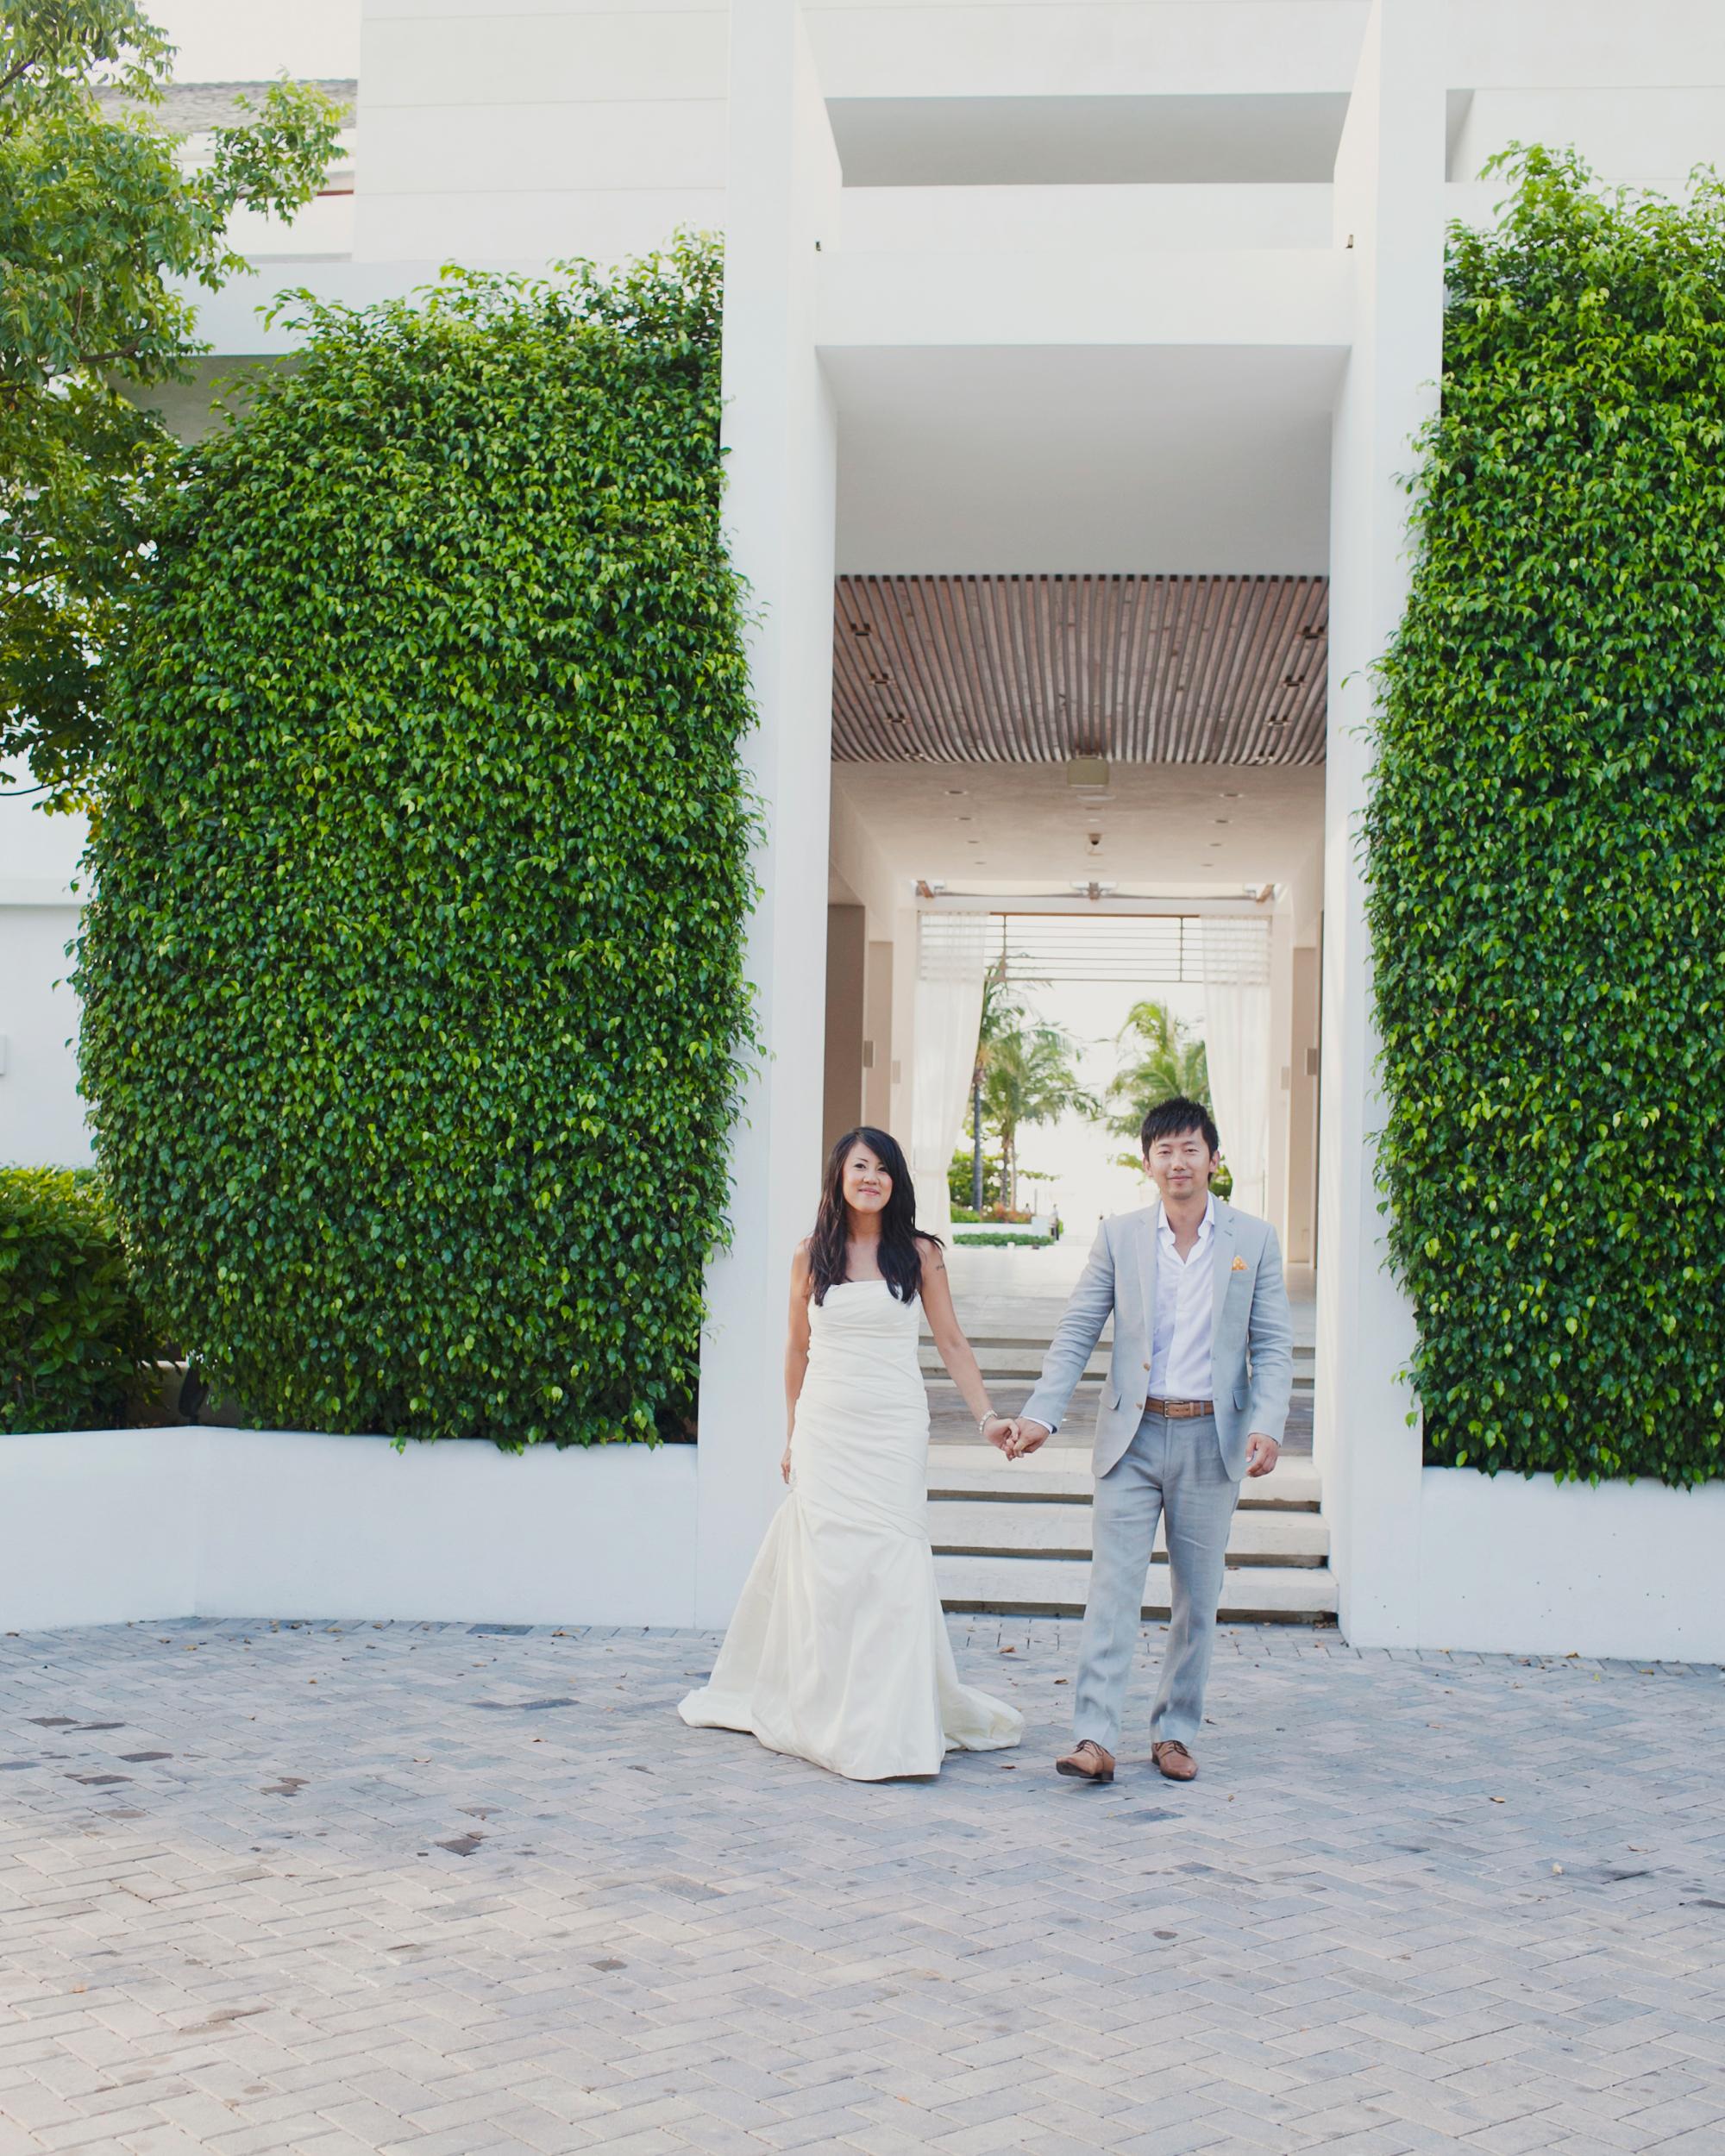 real-weddings-jessica-bobby-0811-302.jpg